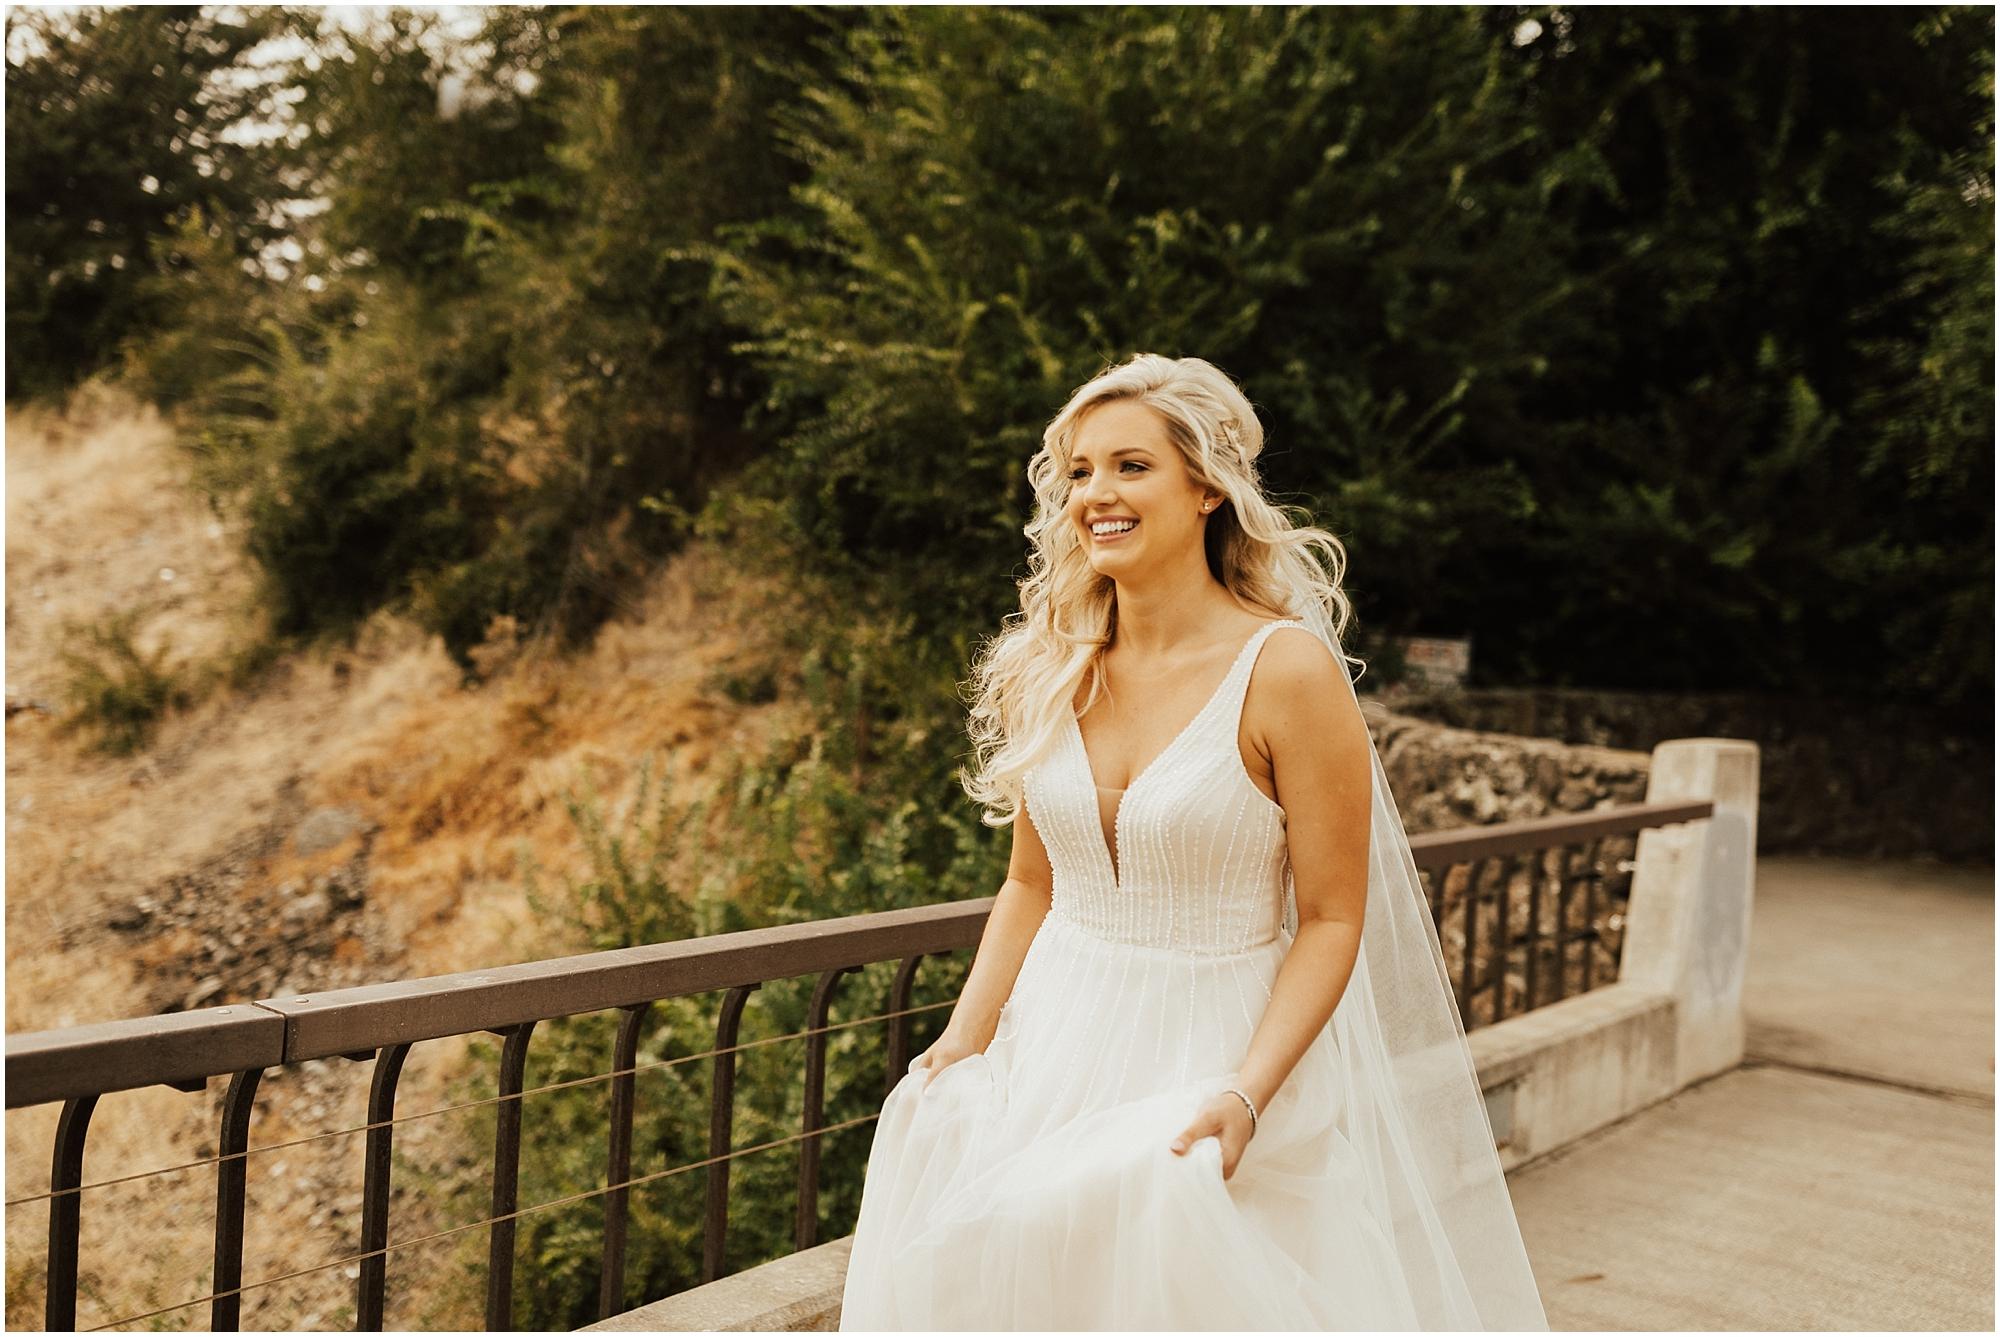 Chateau Rive Spokane Wedding Cassie Trottier Photography1020.jpg